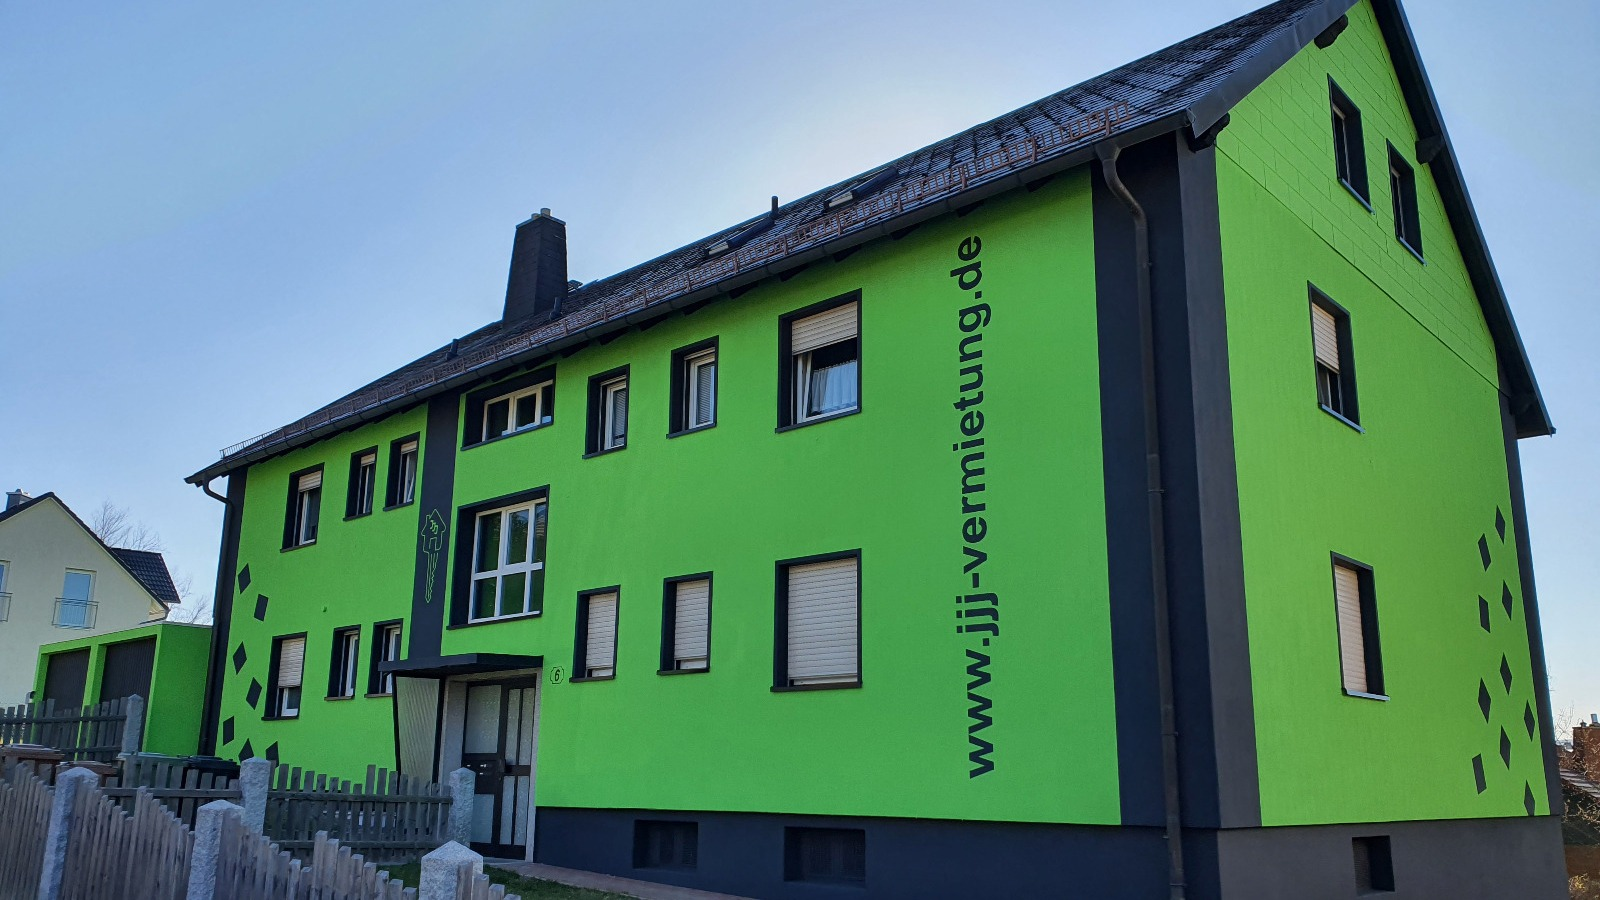 Mehrfamilienhaus Münchberg Döbereiner Straße 6